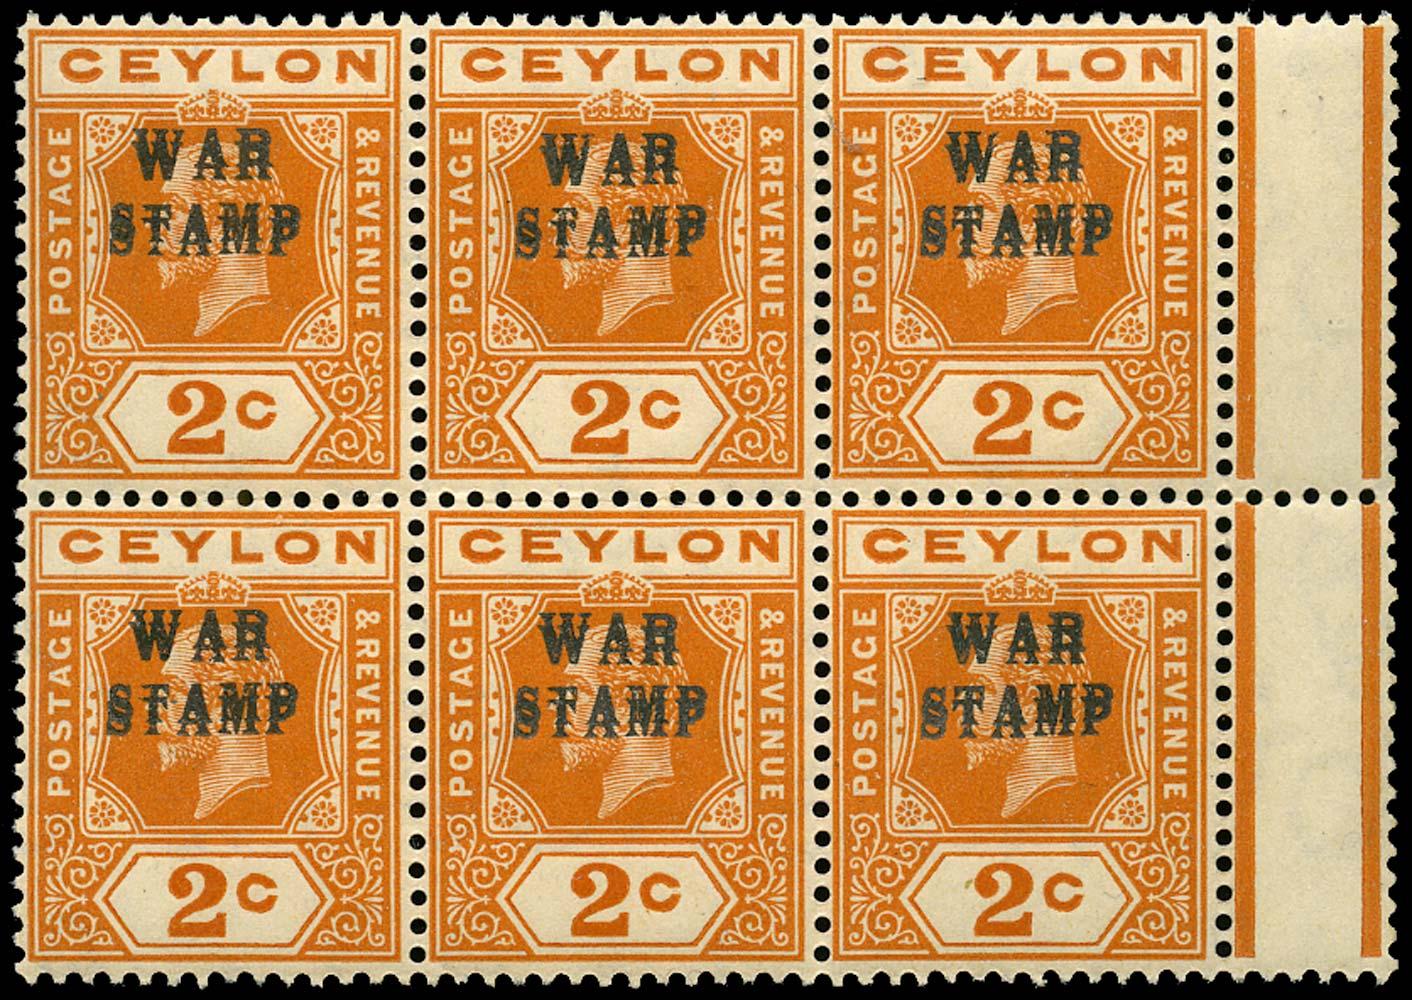 CEYLON 1918  SG330b Mint